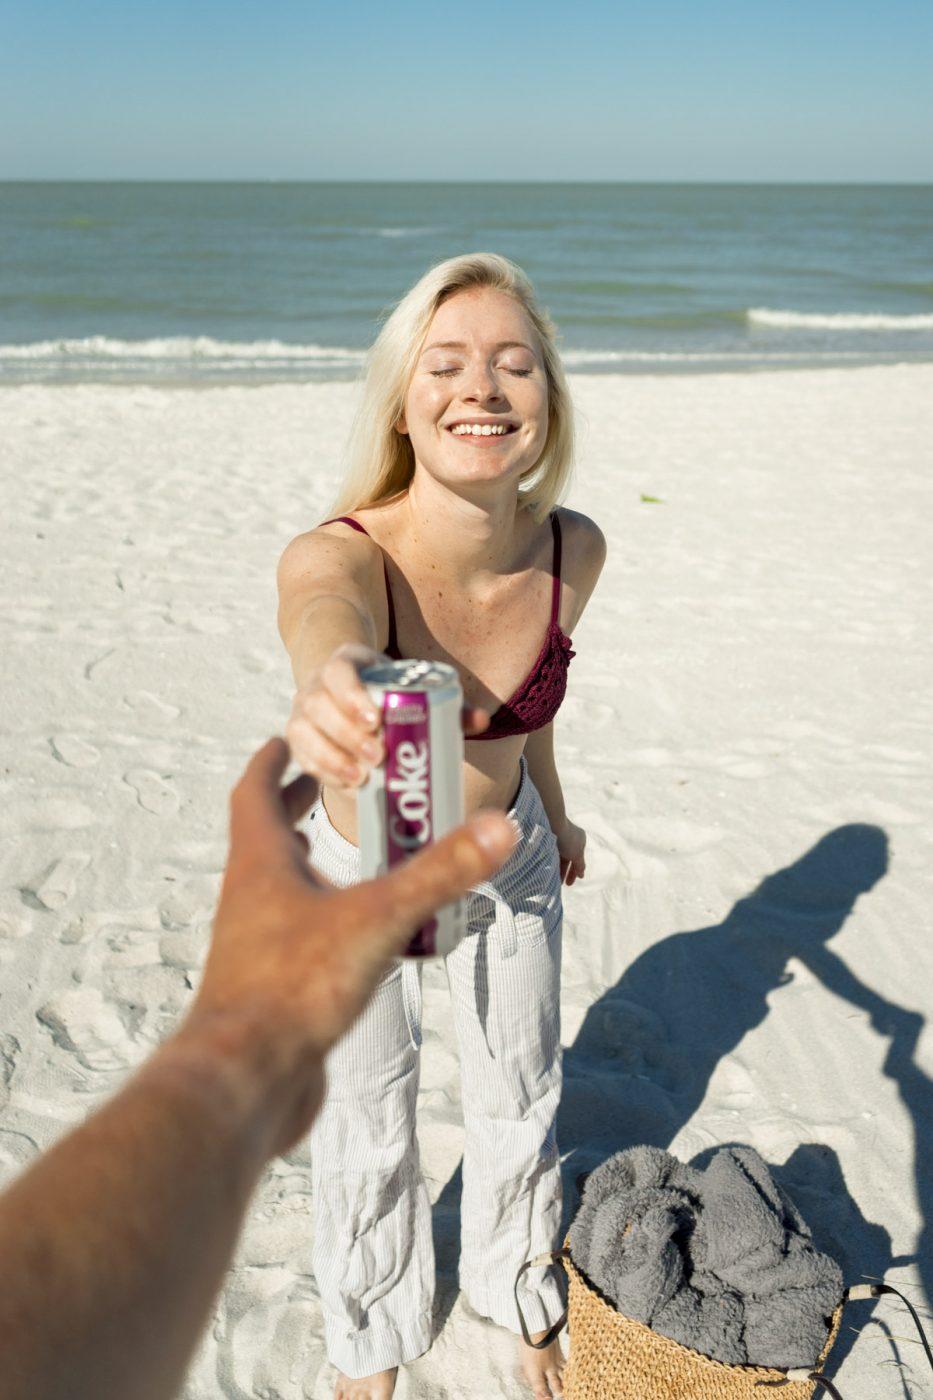 Diet Coke Cherry Beach - Sweet Teal